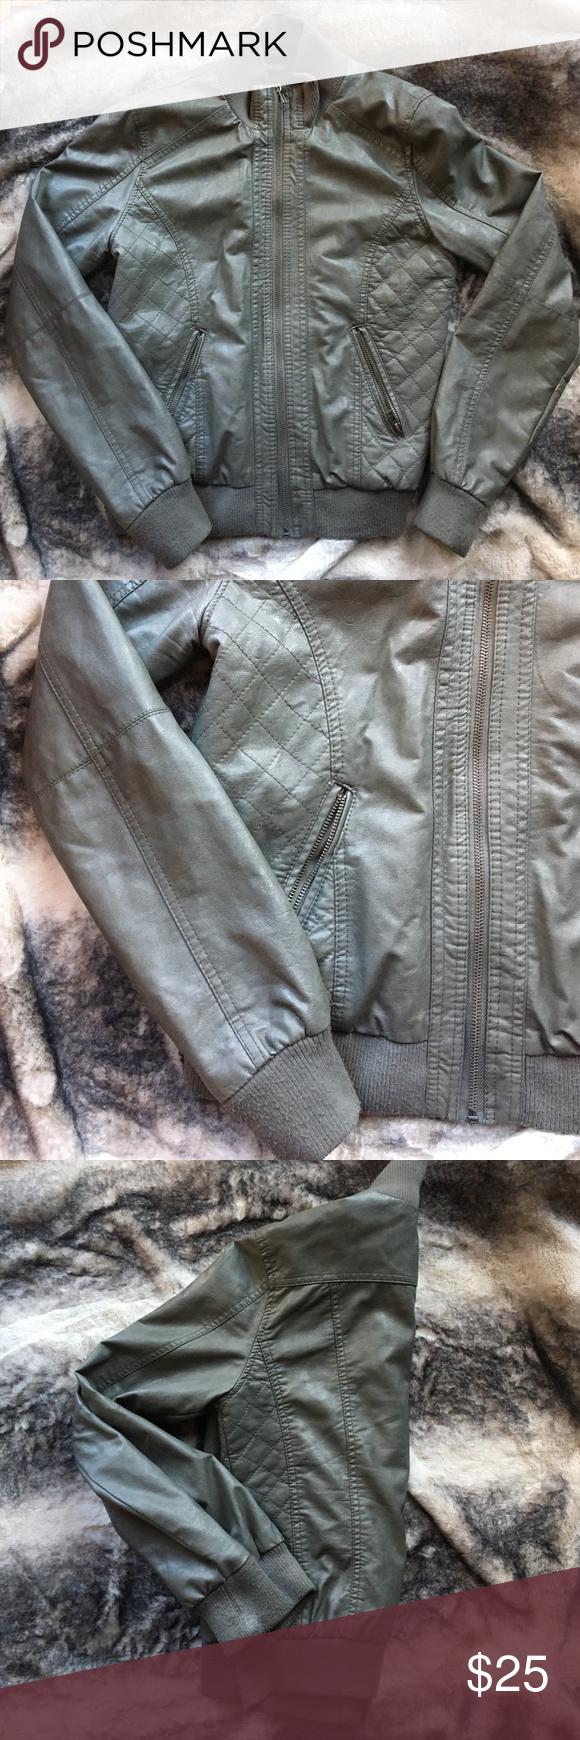 Women's Gray faux leather bomber jacket Women's size M faux leather bomber jacket. Medium wear. Comfortable rayon perfect fall/spring jacket. Xhilaration Jackets & Coats